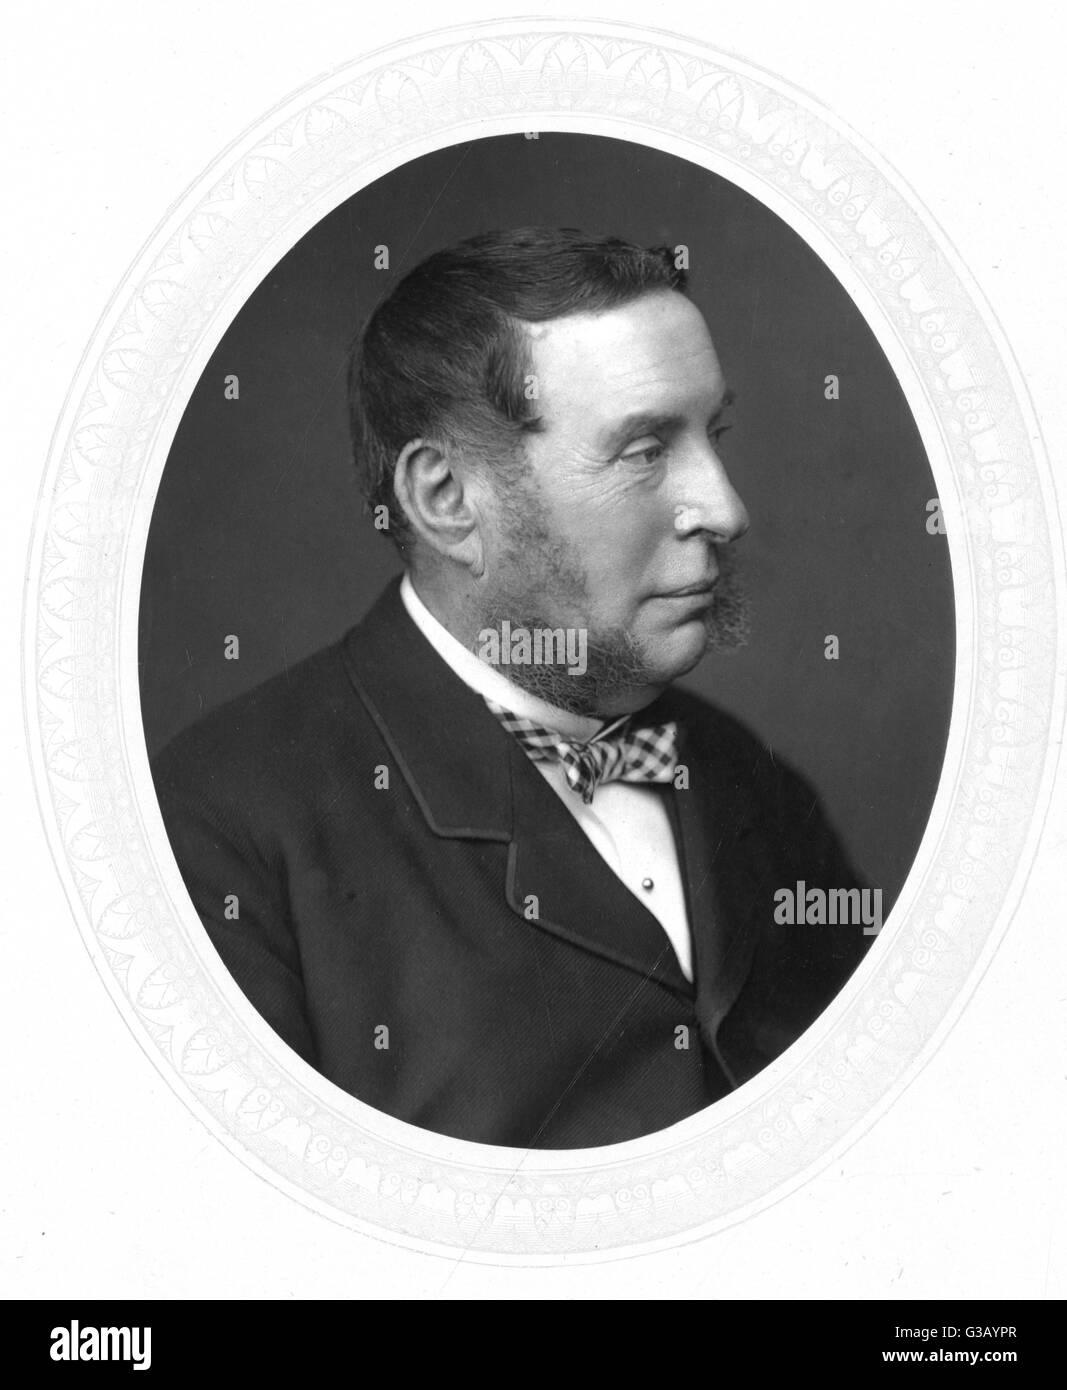 Sir George Jessel  lawyer        Date: 1824 - 1883 - Stock Image